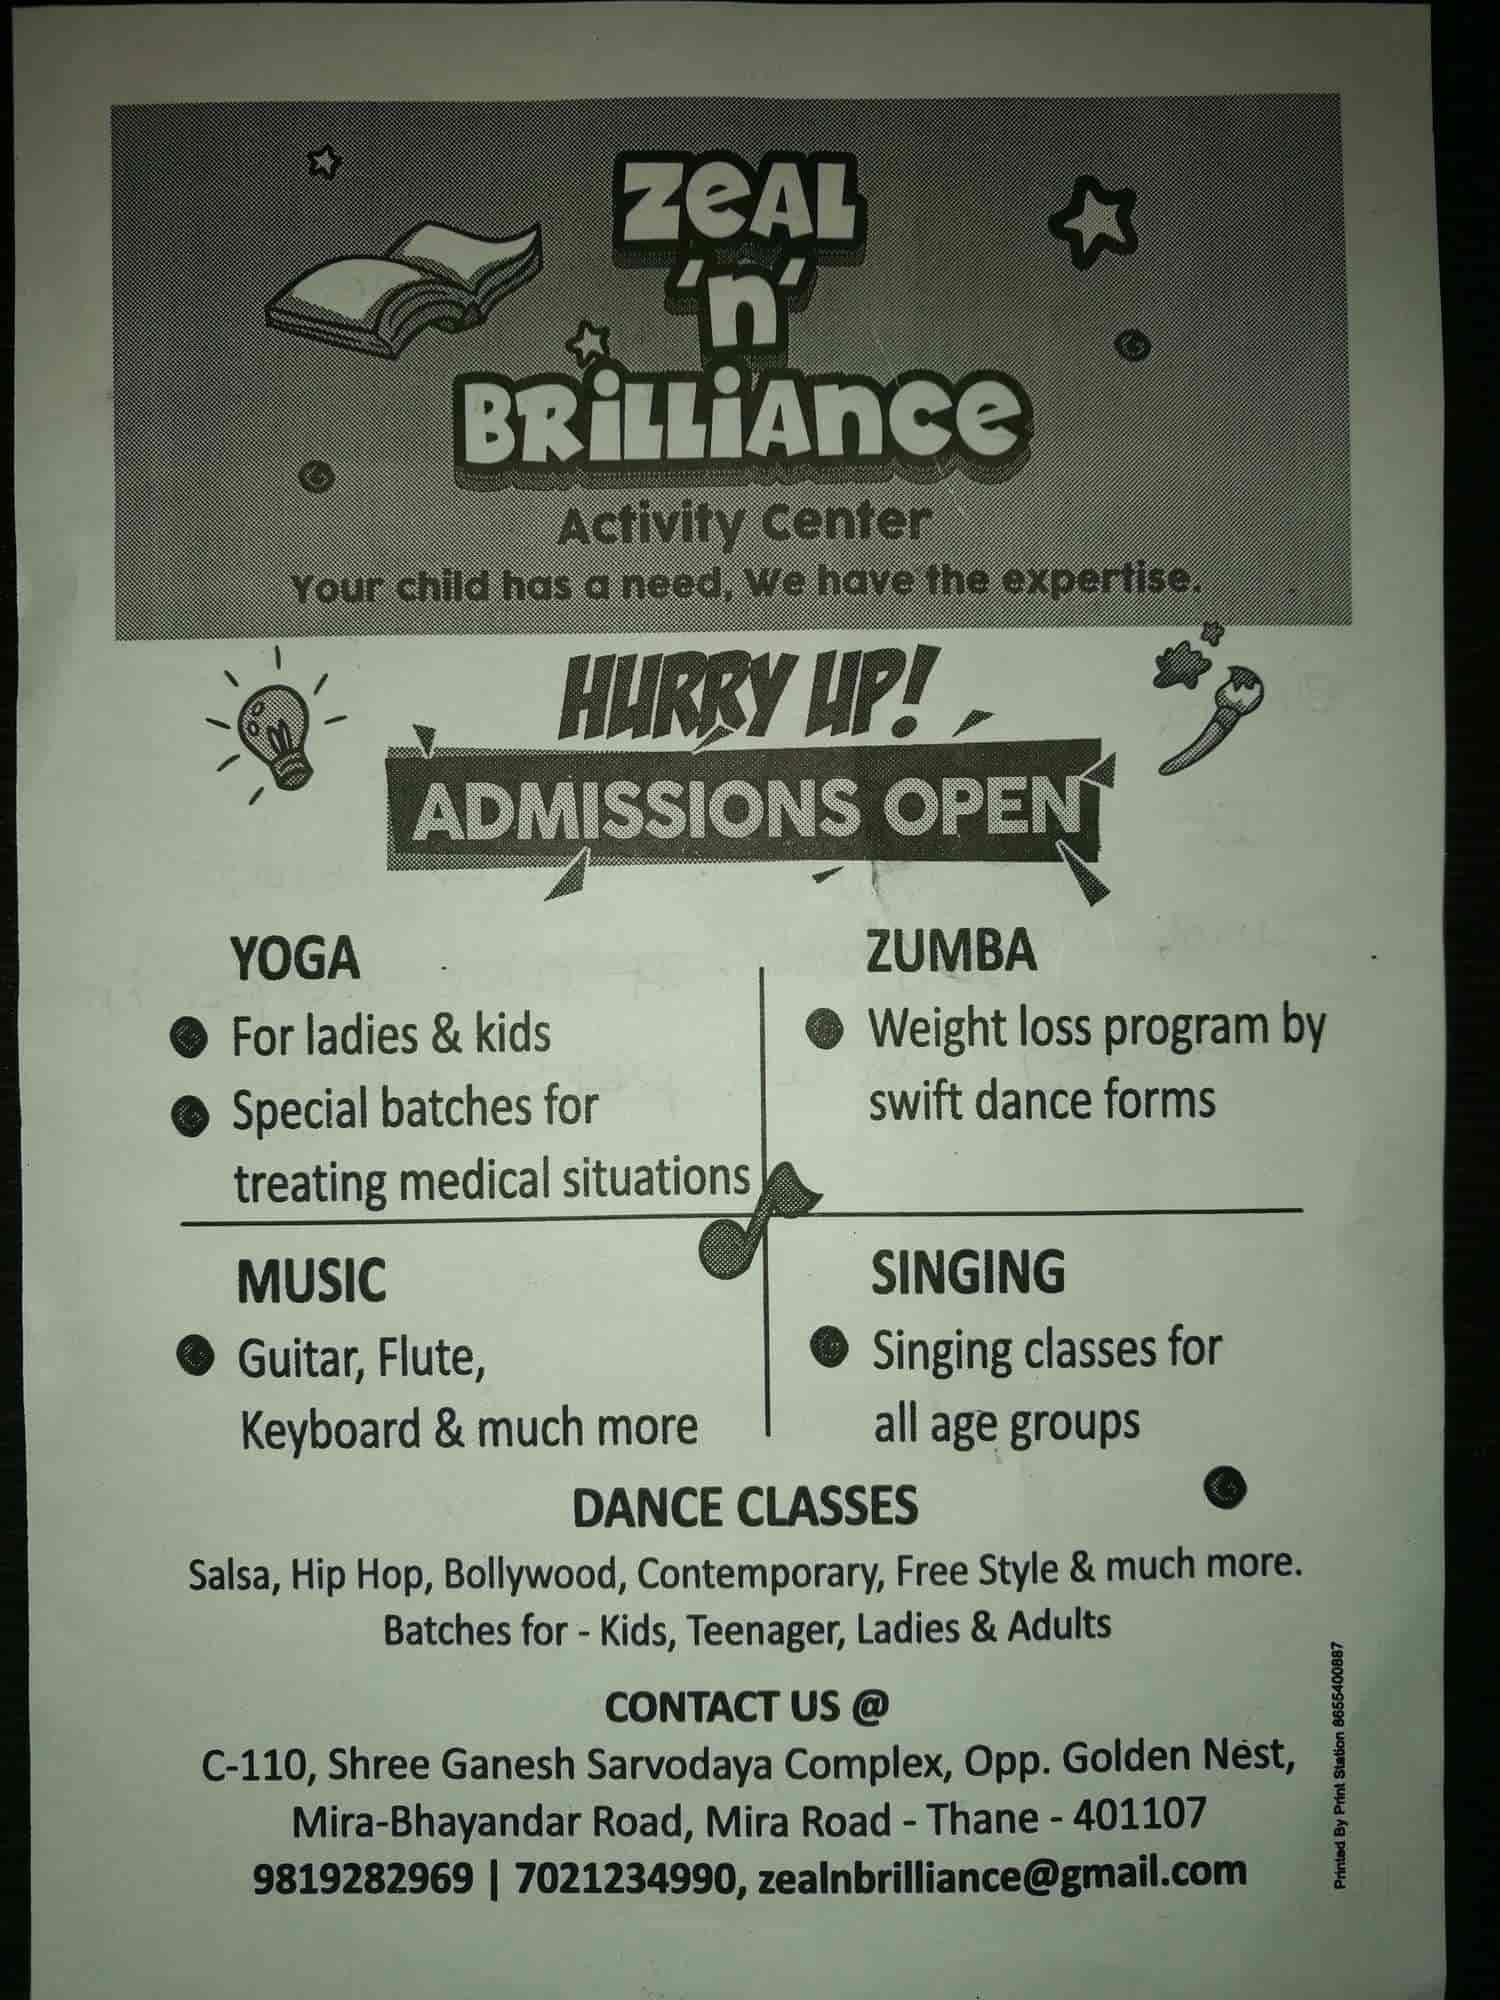 Abc, Mira Road - Dance Classes in Mumbai - Justdial